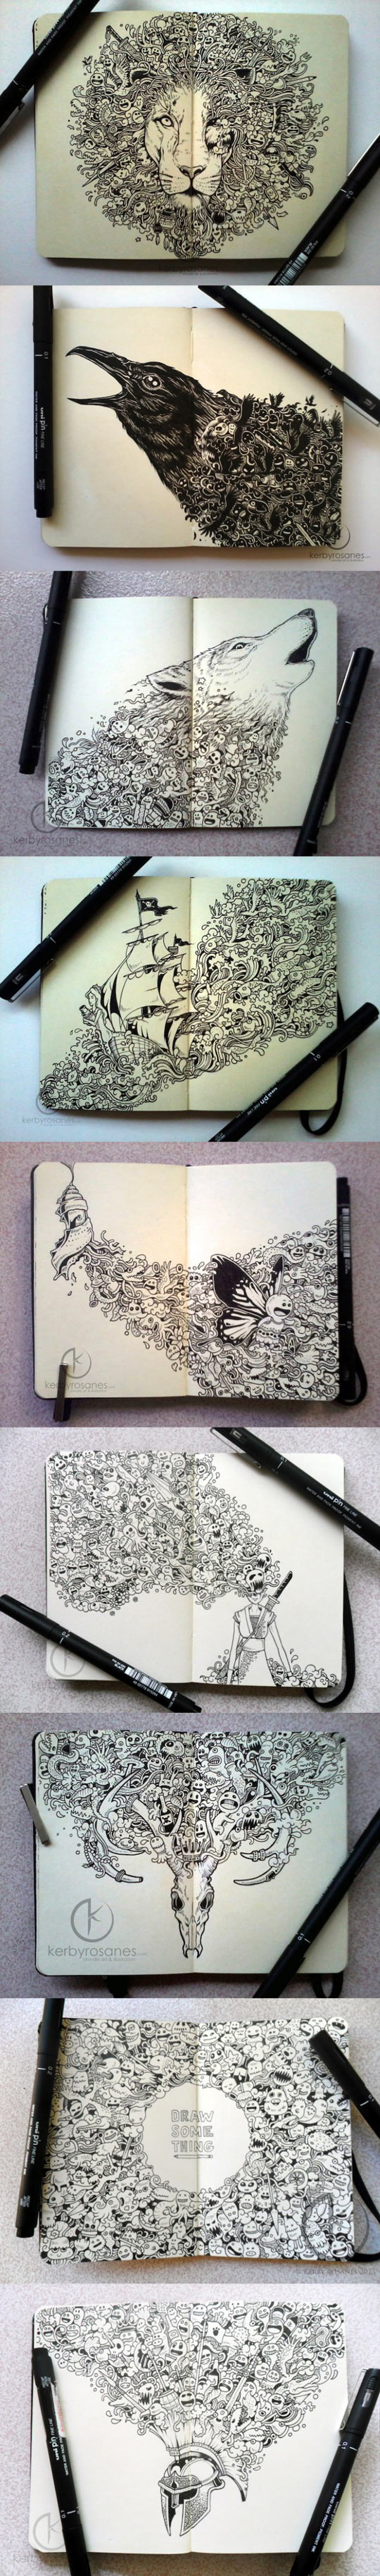 Incredible Moleskine drawings…